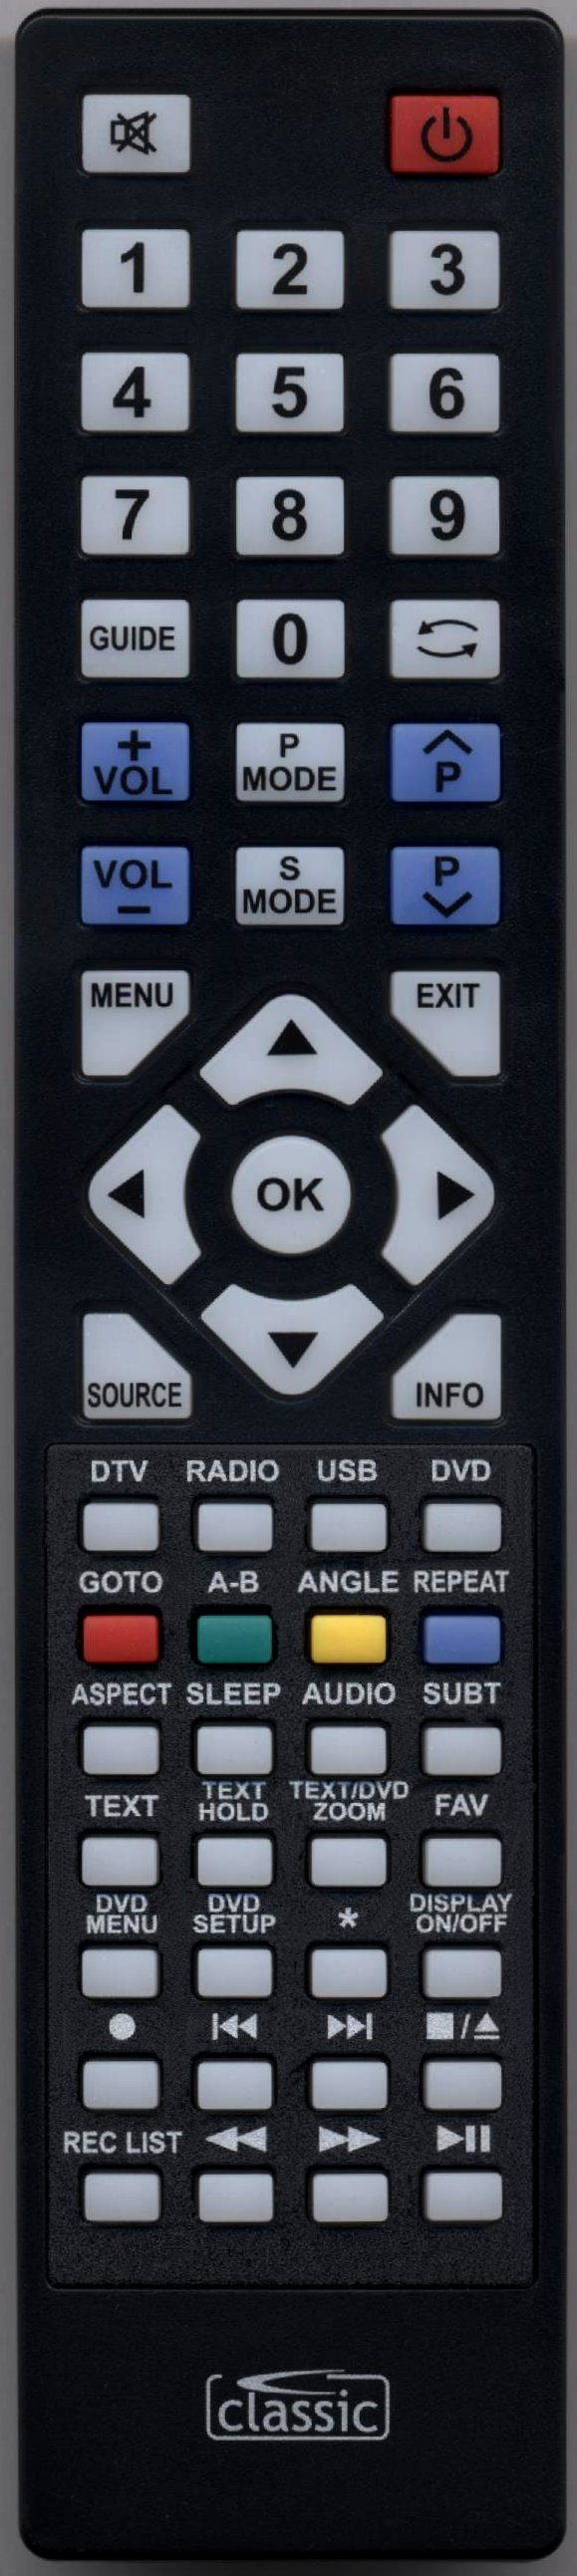 BLAUPUNKT 32/138O-GB-11B4-EGDP-UK Remote Control Alternative